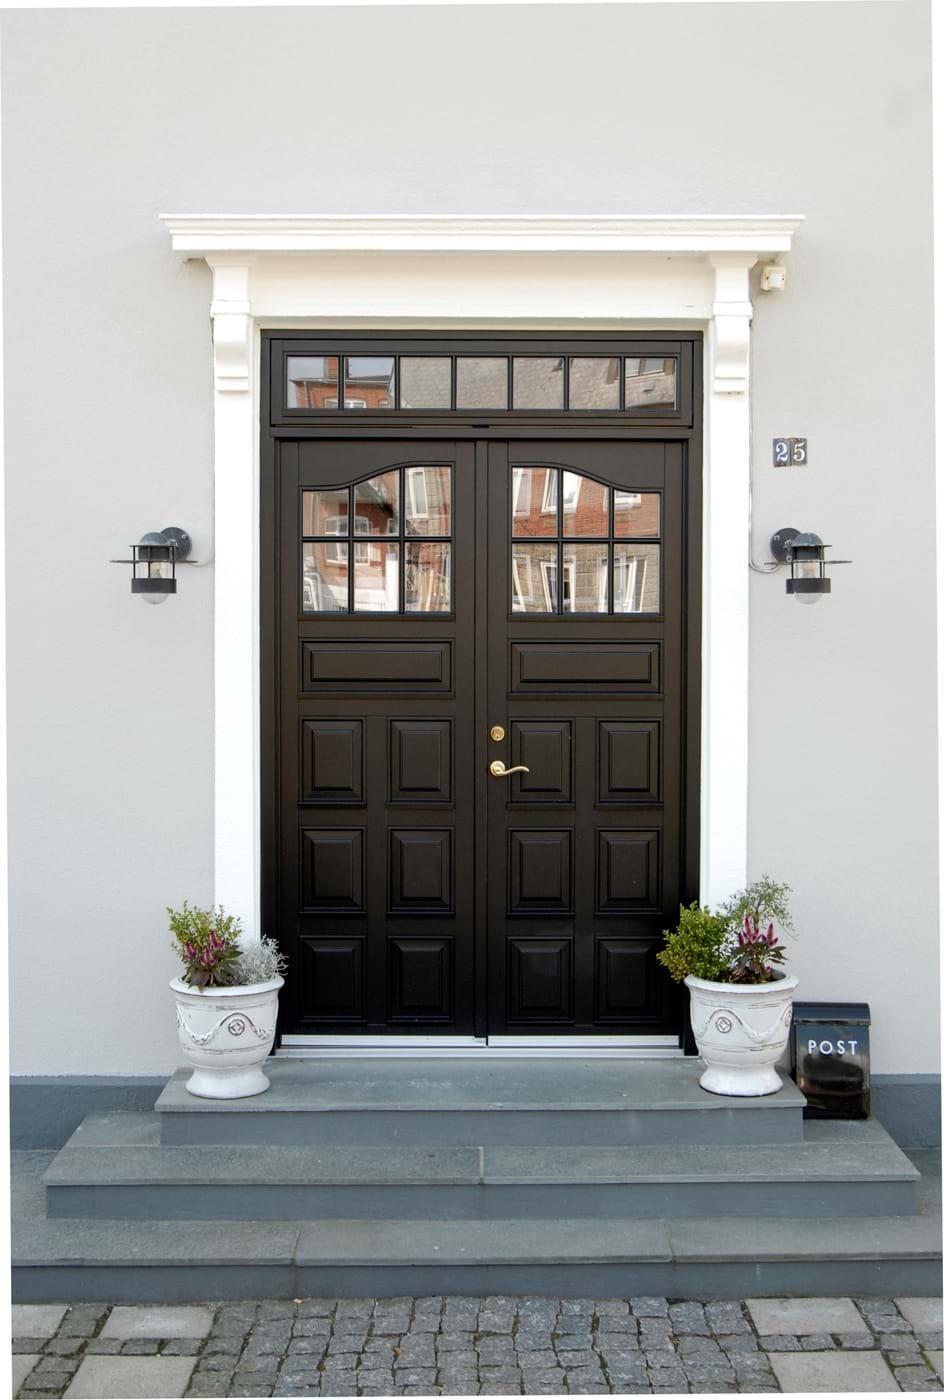 Nye døre JM låseservice